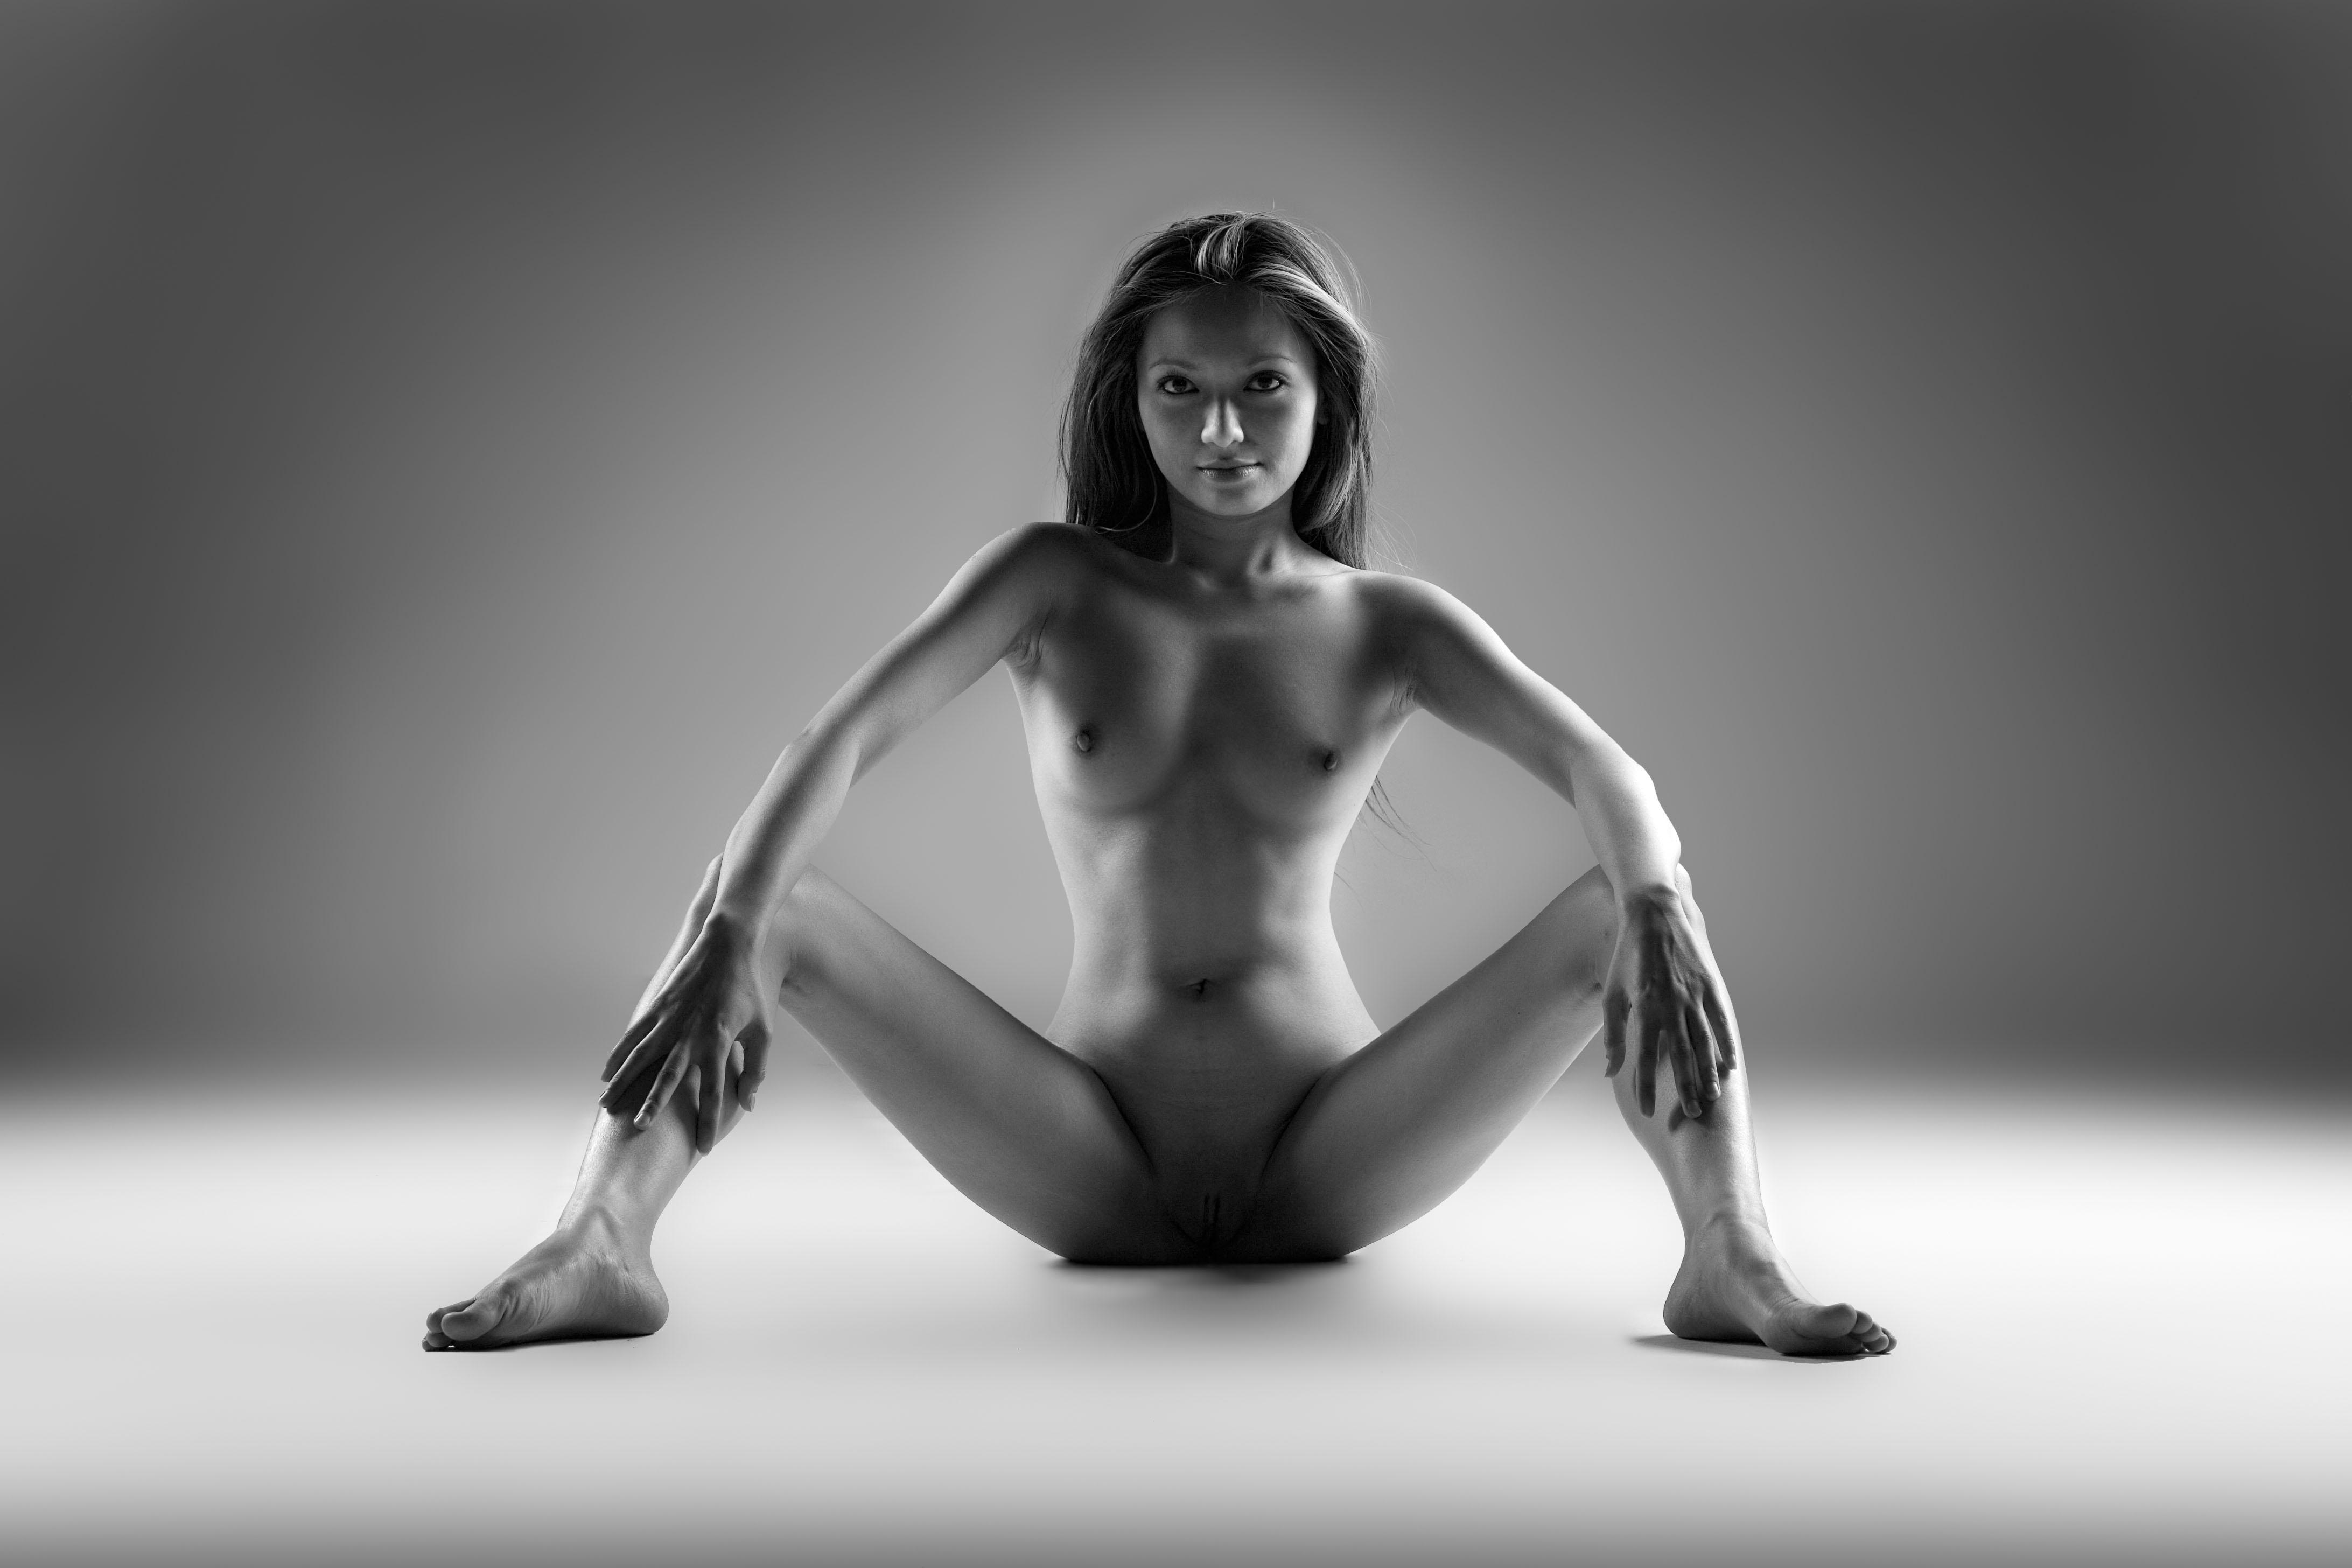 Kenton recommend best of art nude asian